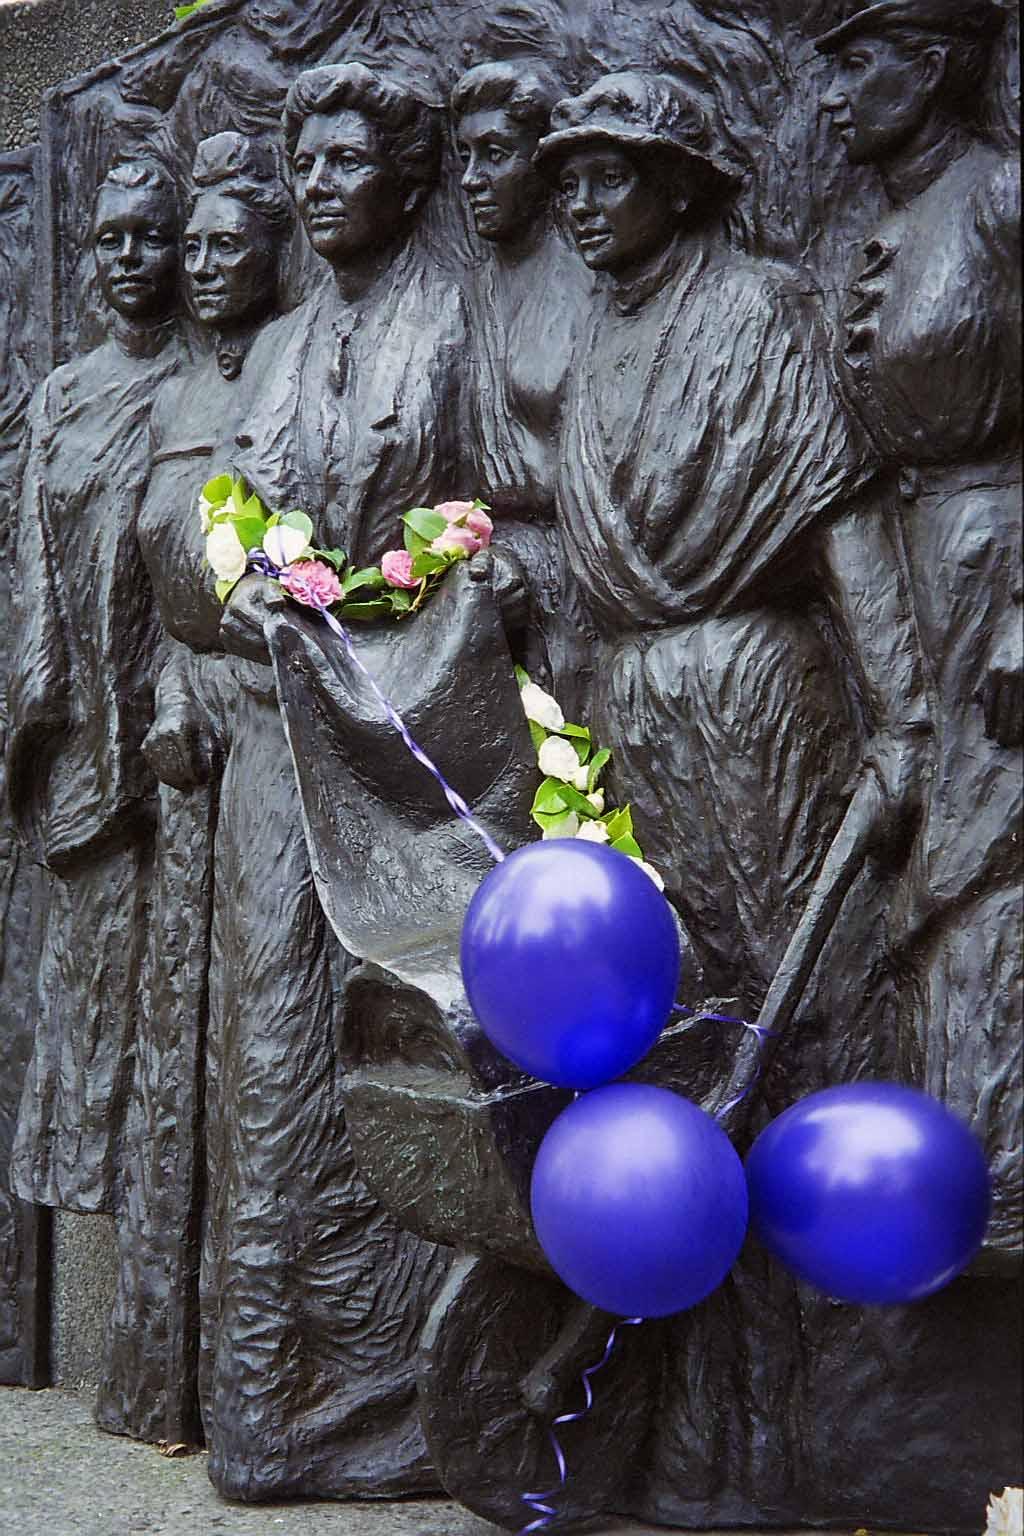 Kate Sheppard: suffrage hero or that bloodywoman?